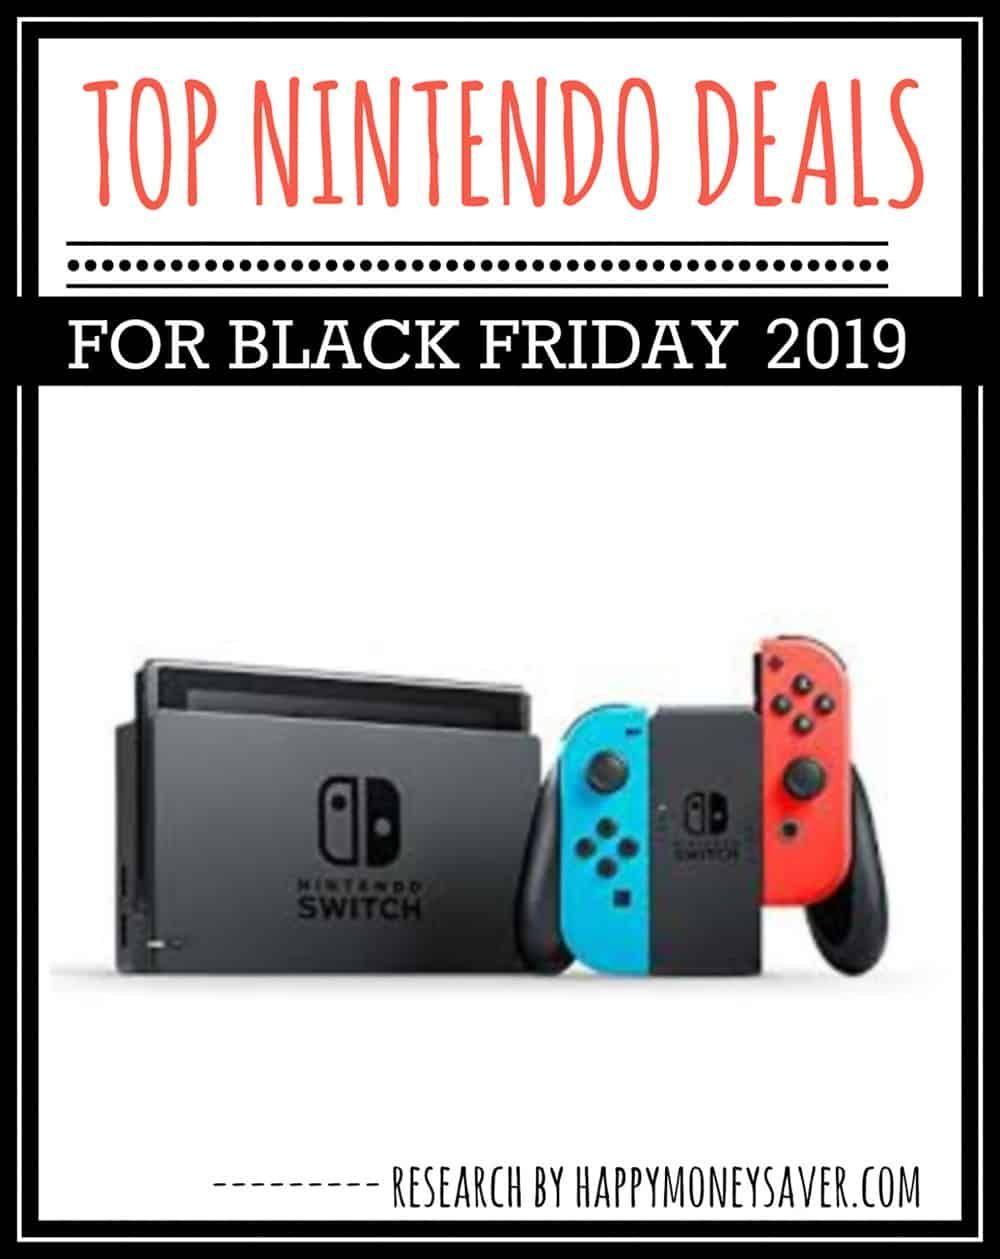 Top Nintendo Switch Black Friday 2019 Deals Happy Money Saver In 2020 Black Friday 2019 Black Friday Nintendo